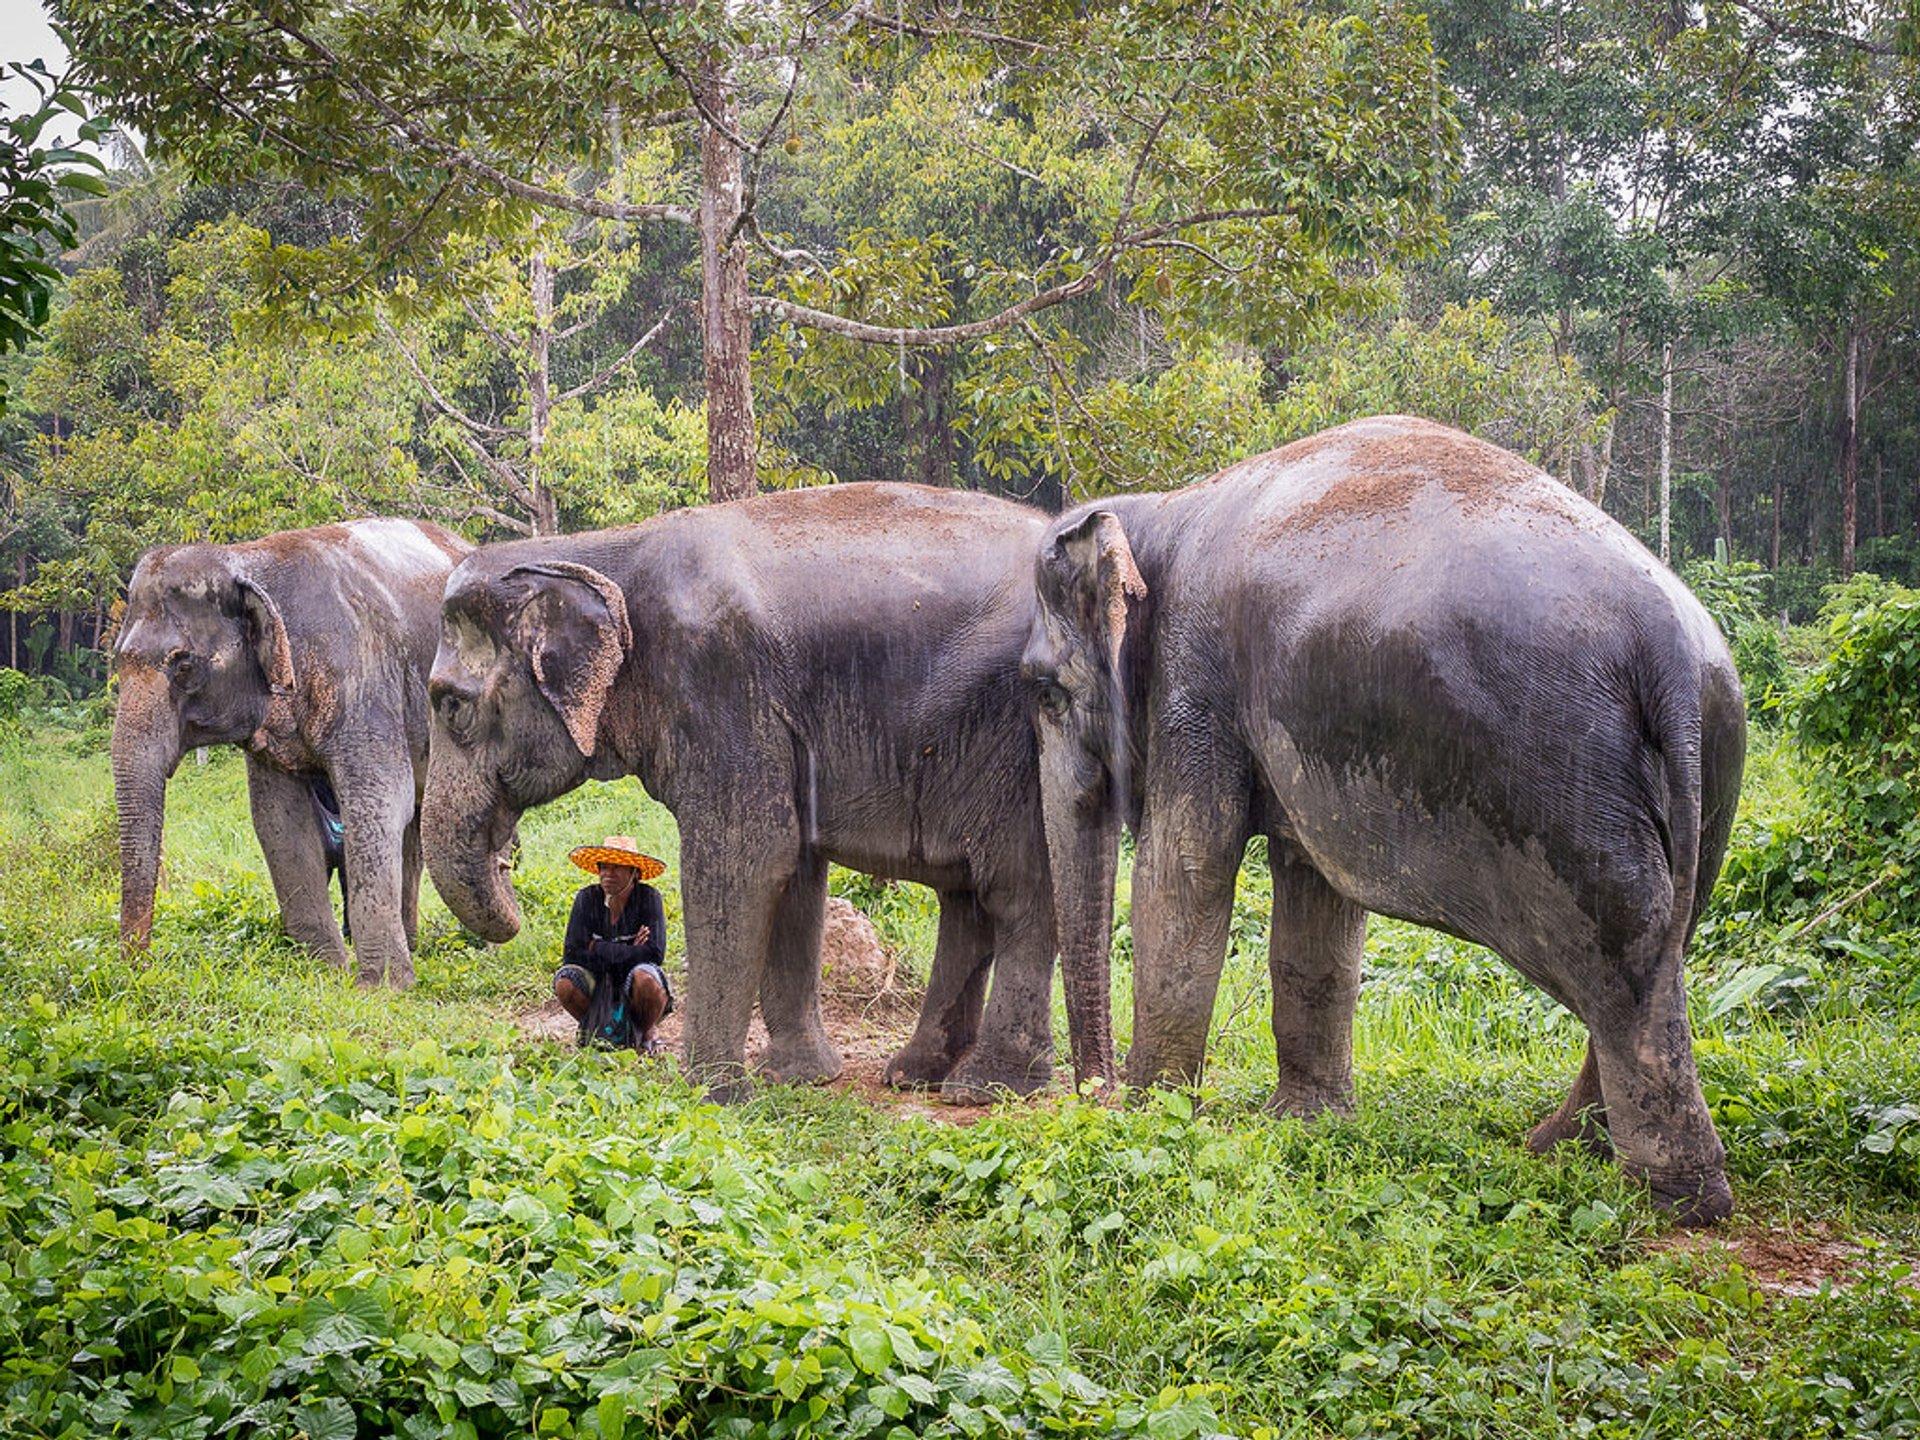 Elephant Sanctuaries in Phuket 2020 - Best Time